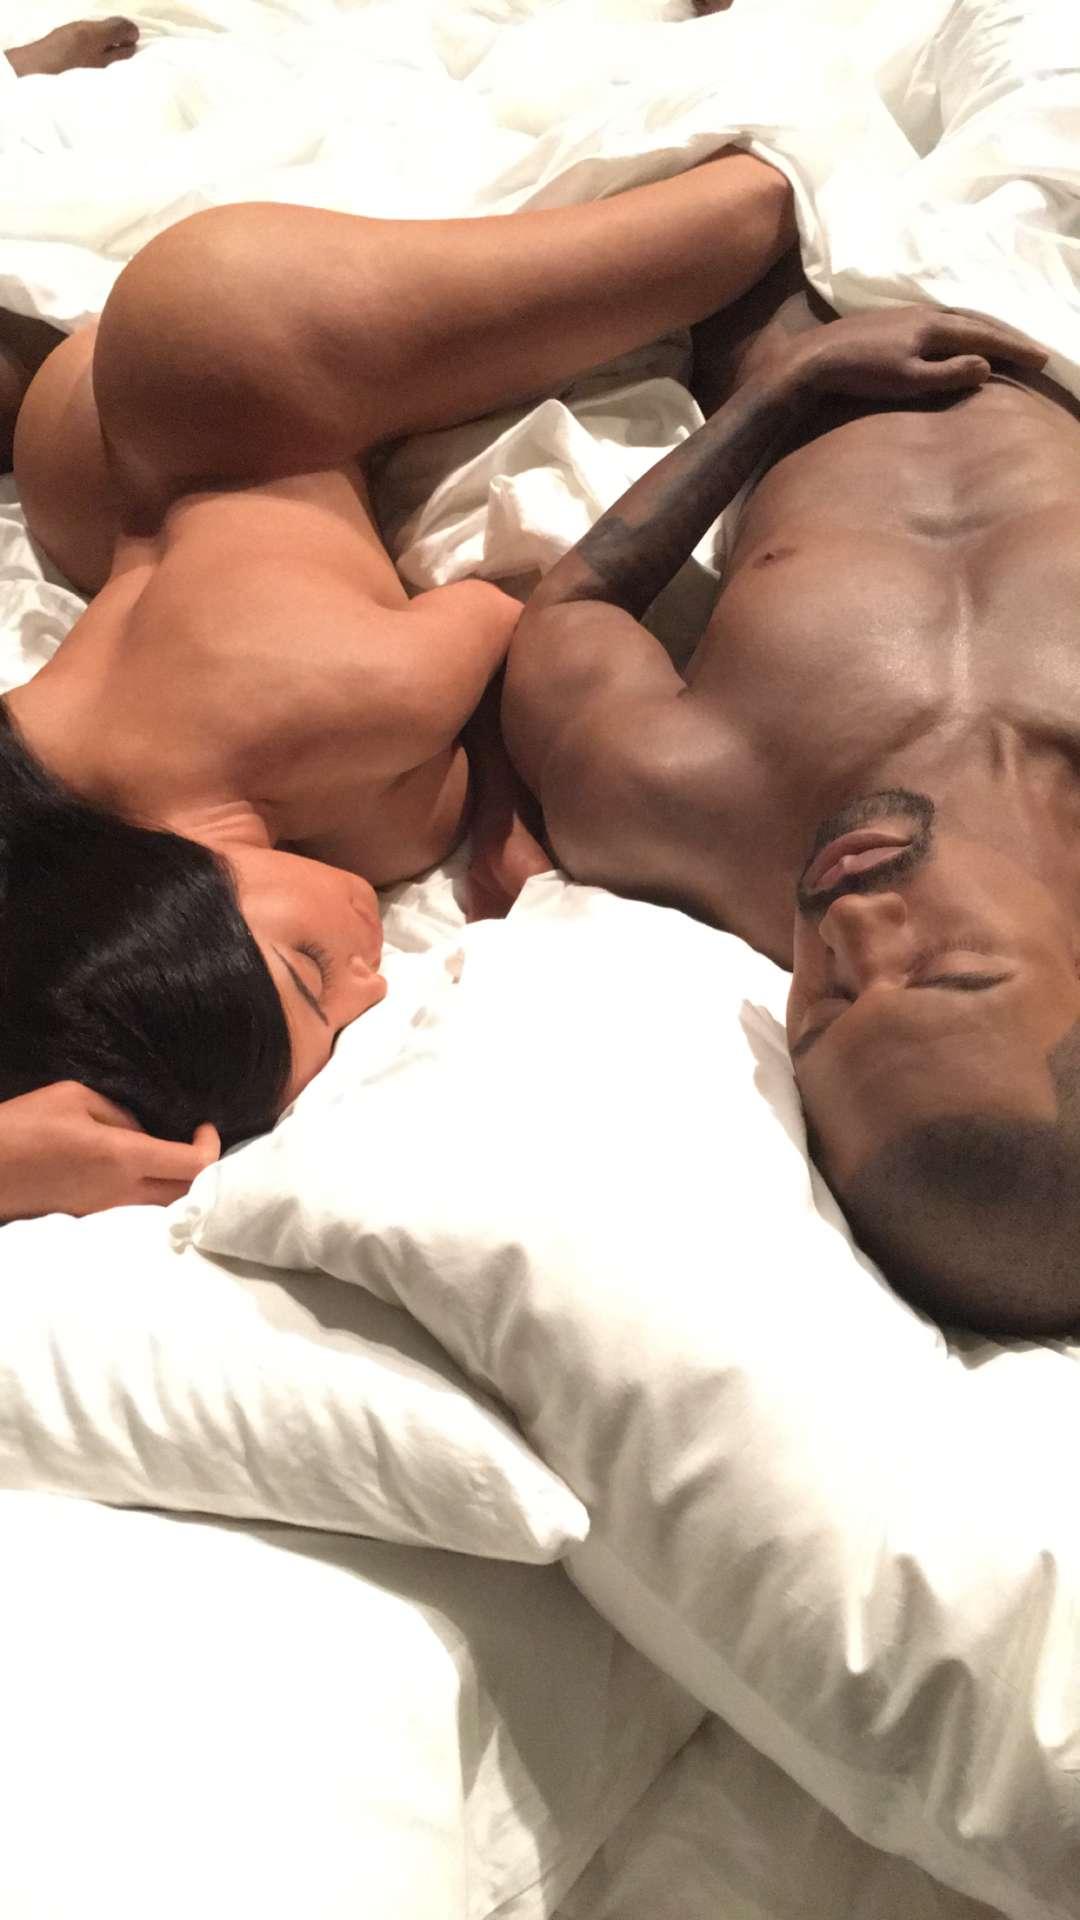 Kim Kardashian Sex Tape Full Length